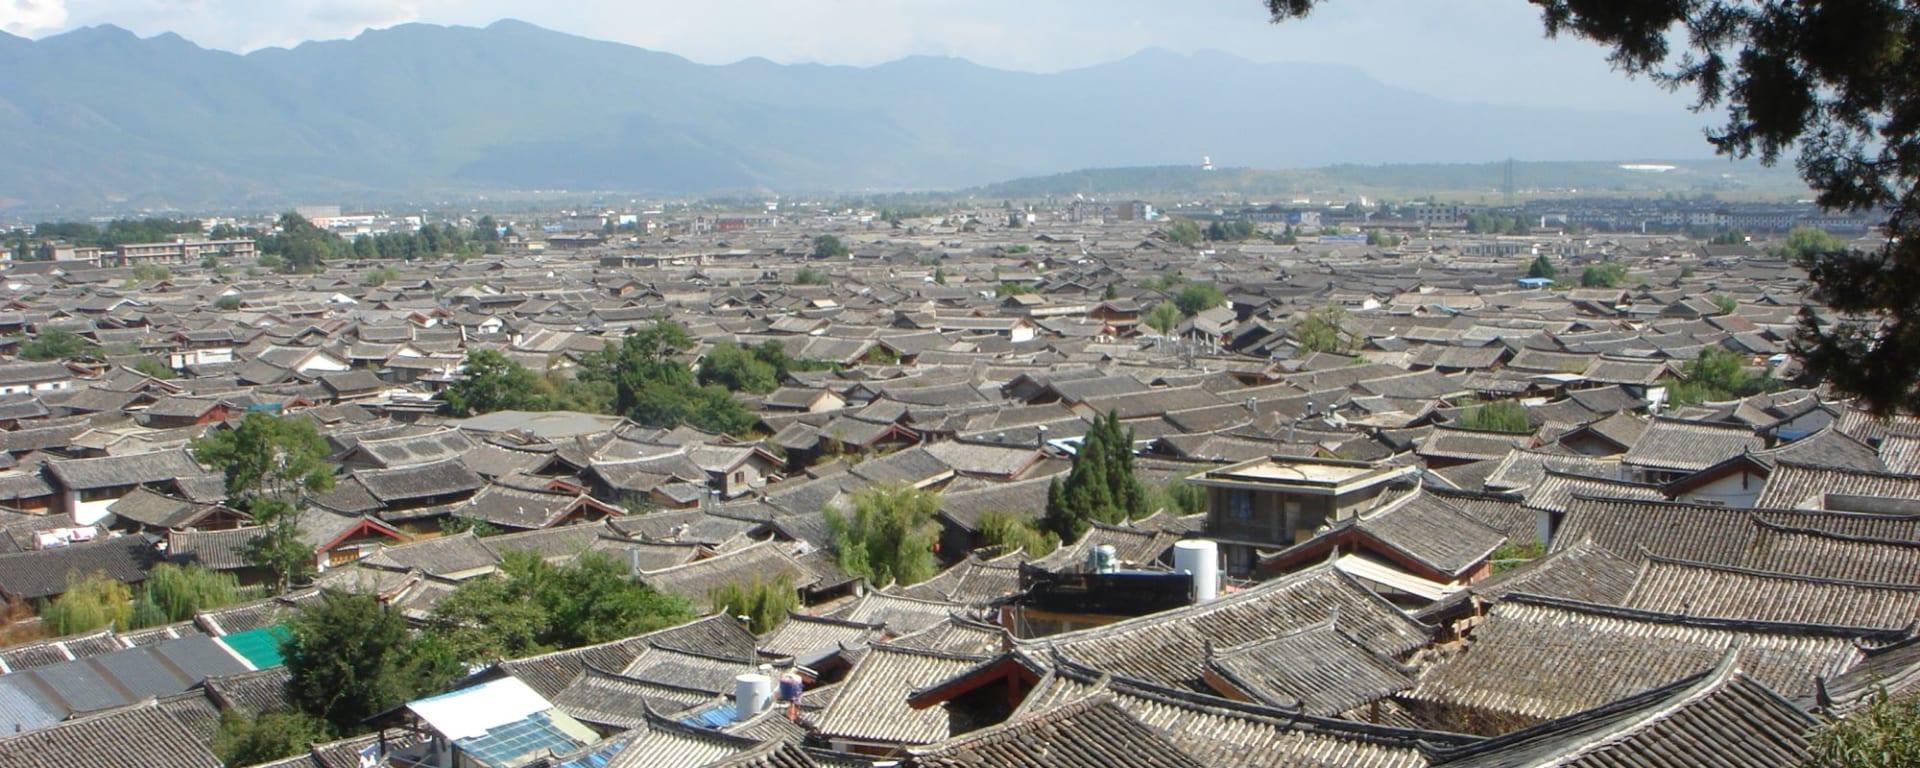 Les hauts lieux du Yunnan de Kunming: Lijiang: roof tops